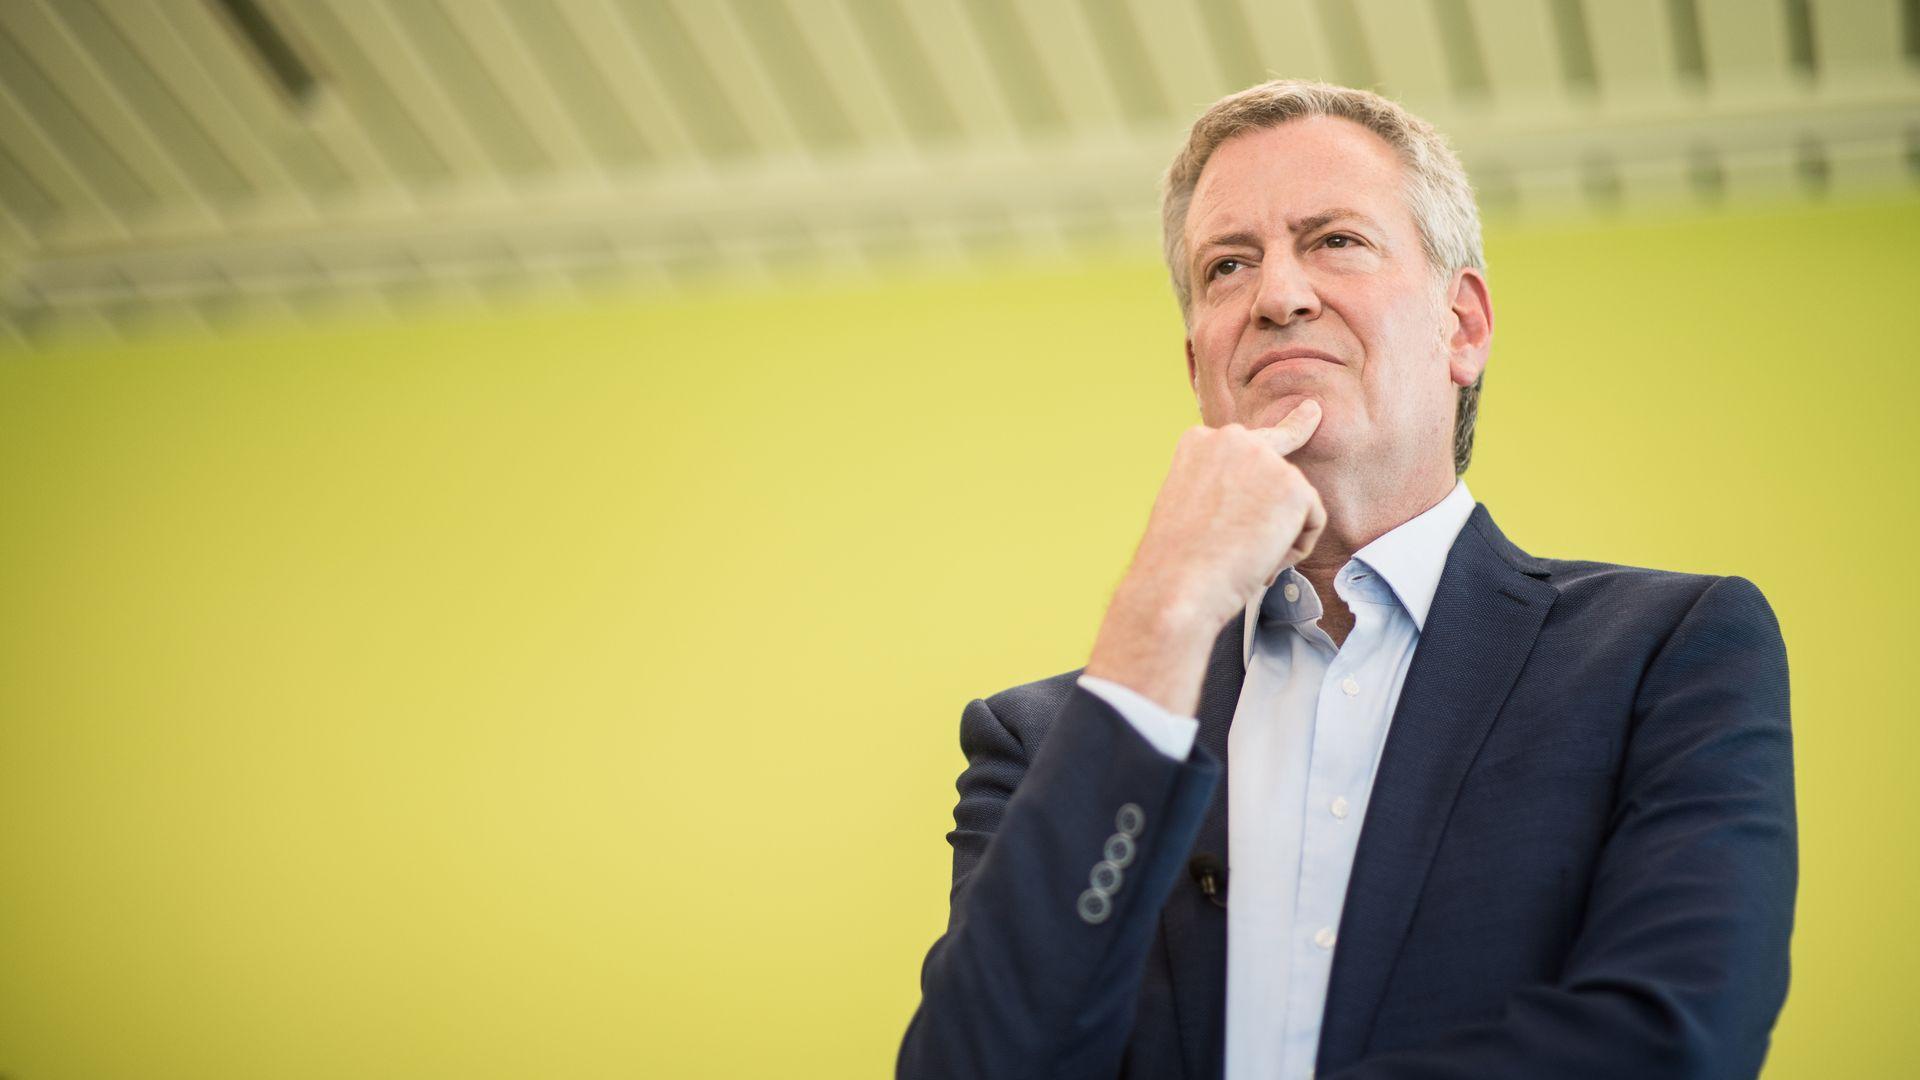 NYC Mayor Bill de Blasio polls at the bottom of Democrats